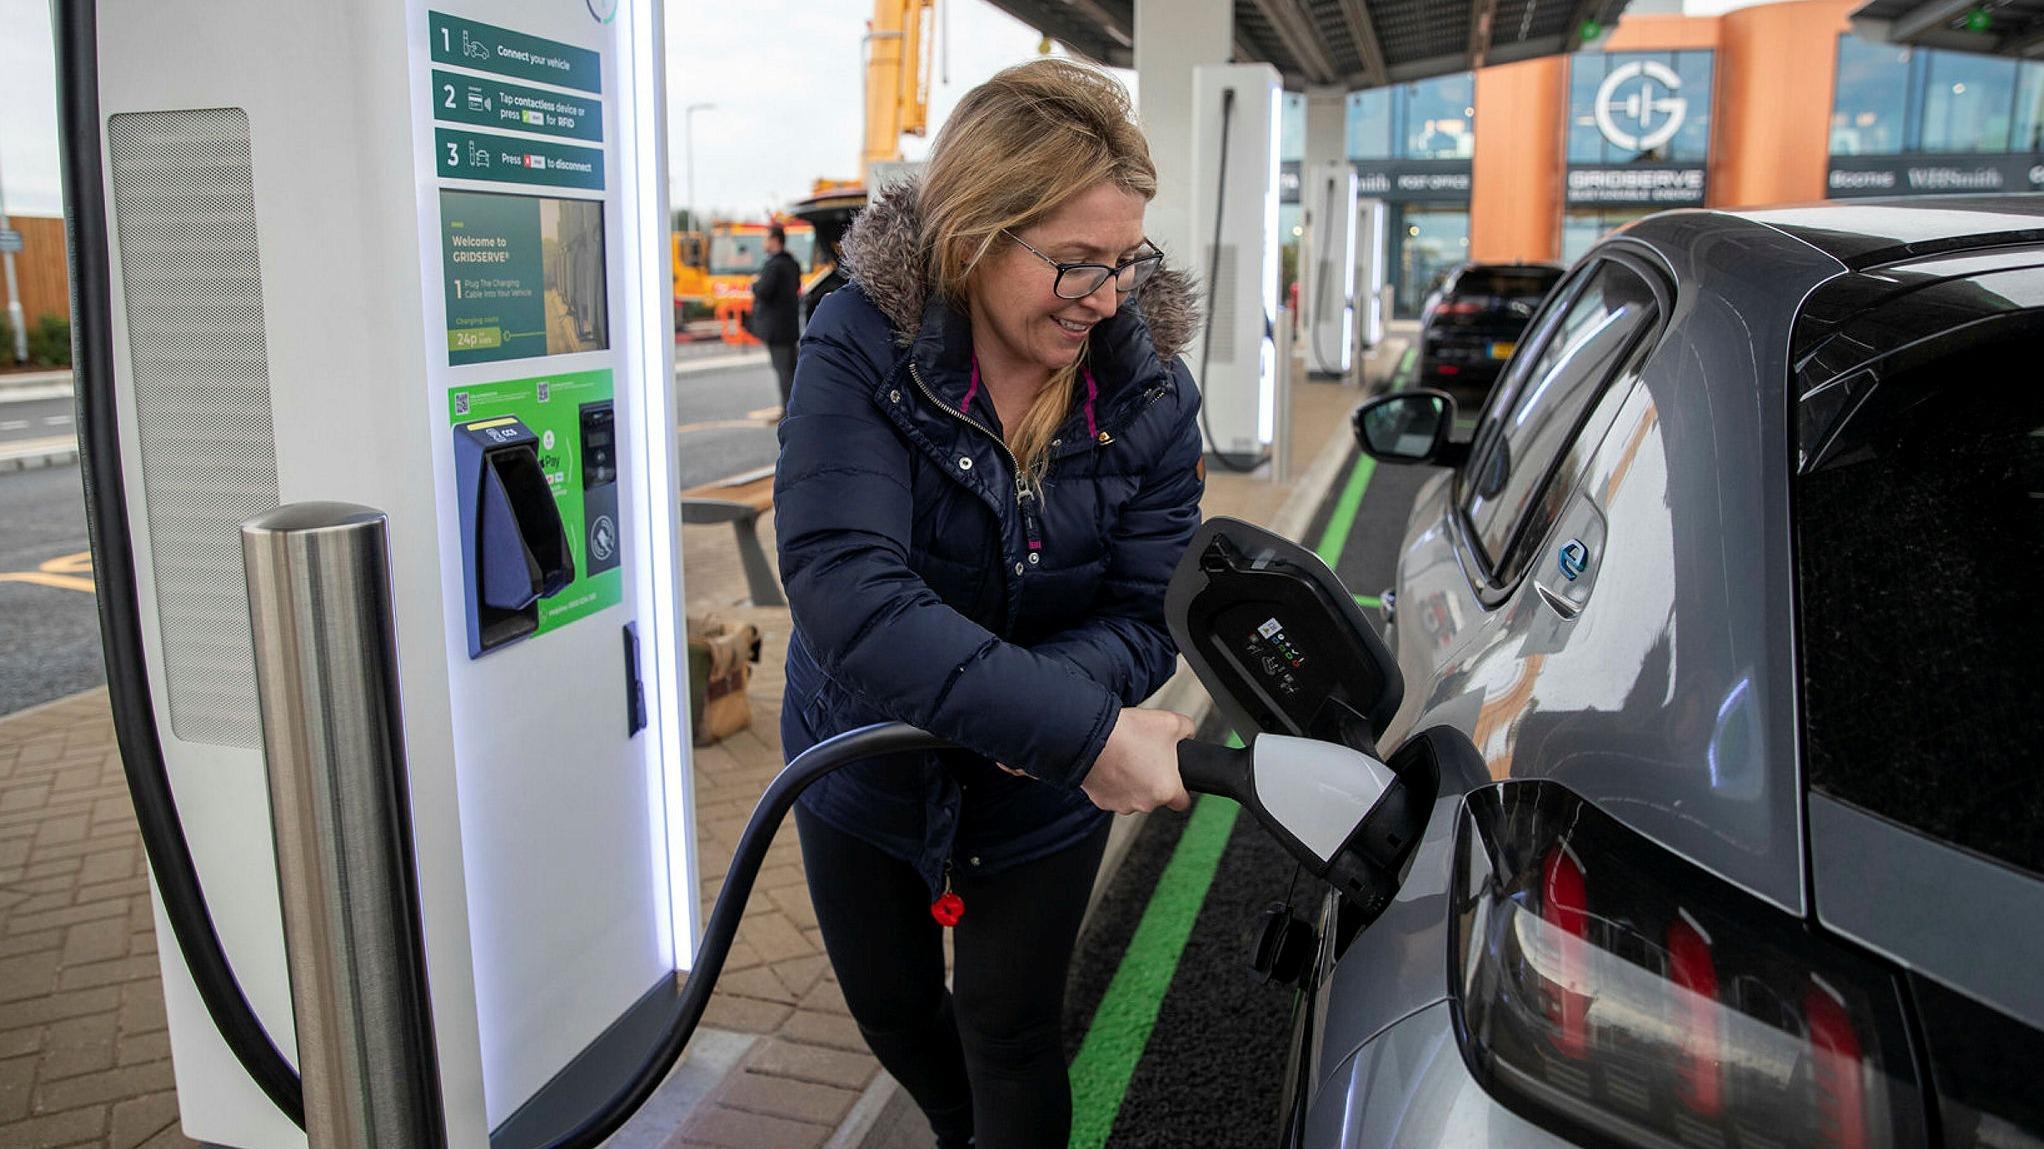 ft.com - Nathalie Thomas in Edinburgh and Peter Campbell in London - EV charging groups race to meet UK's 2030 petrol and diesel car sales ban